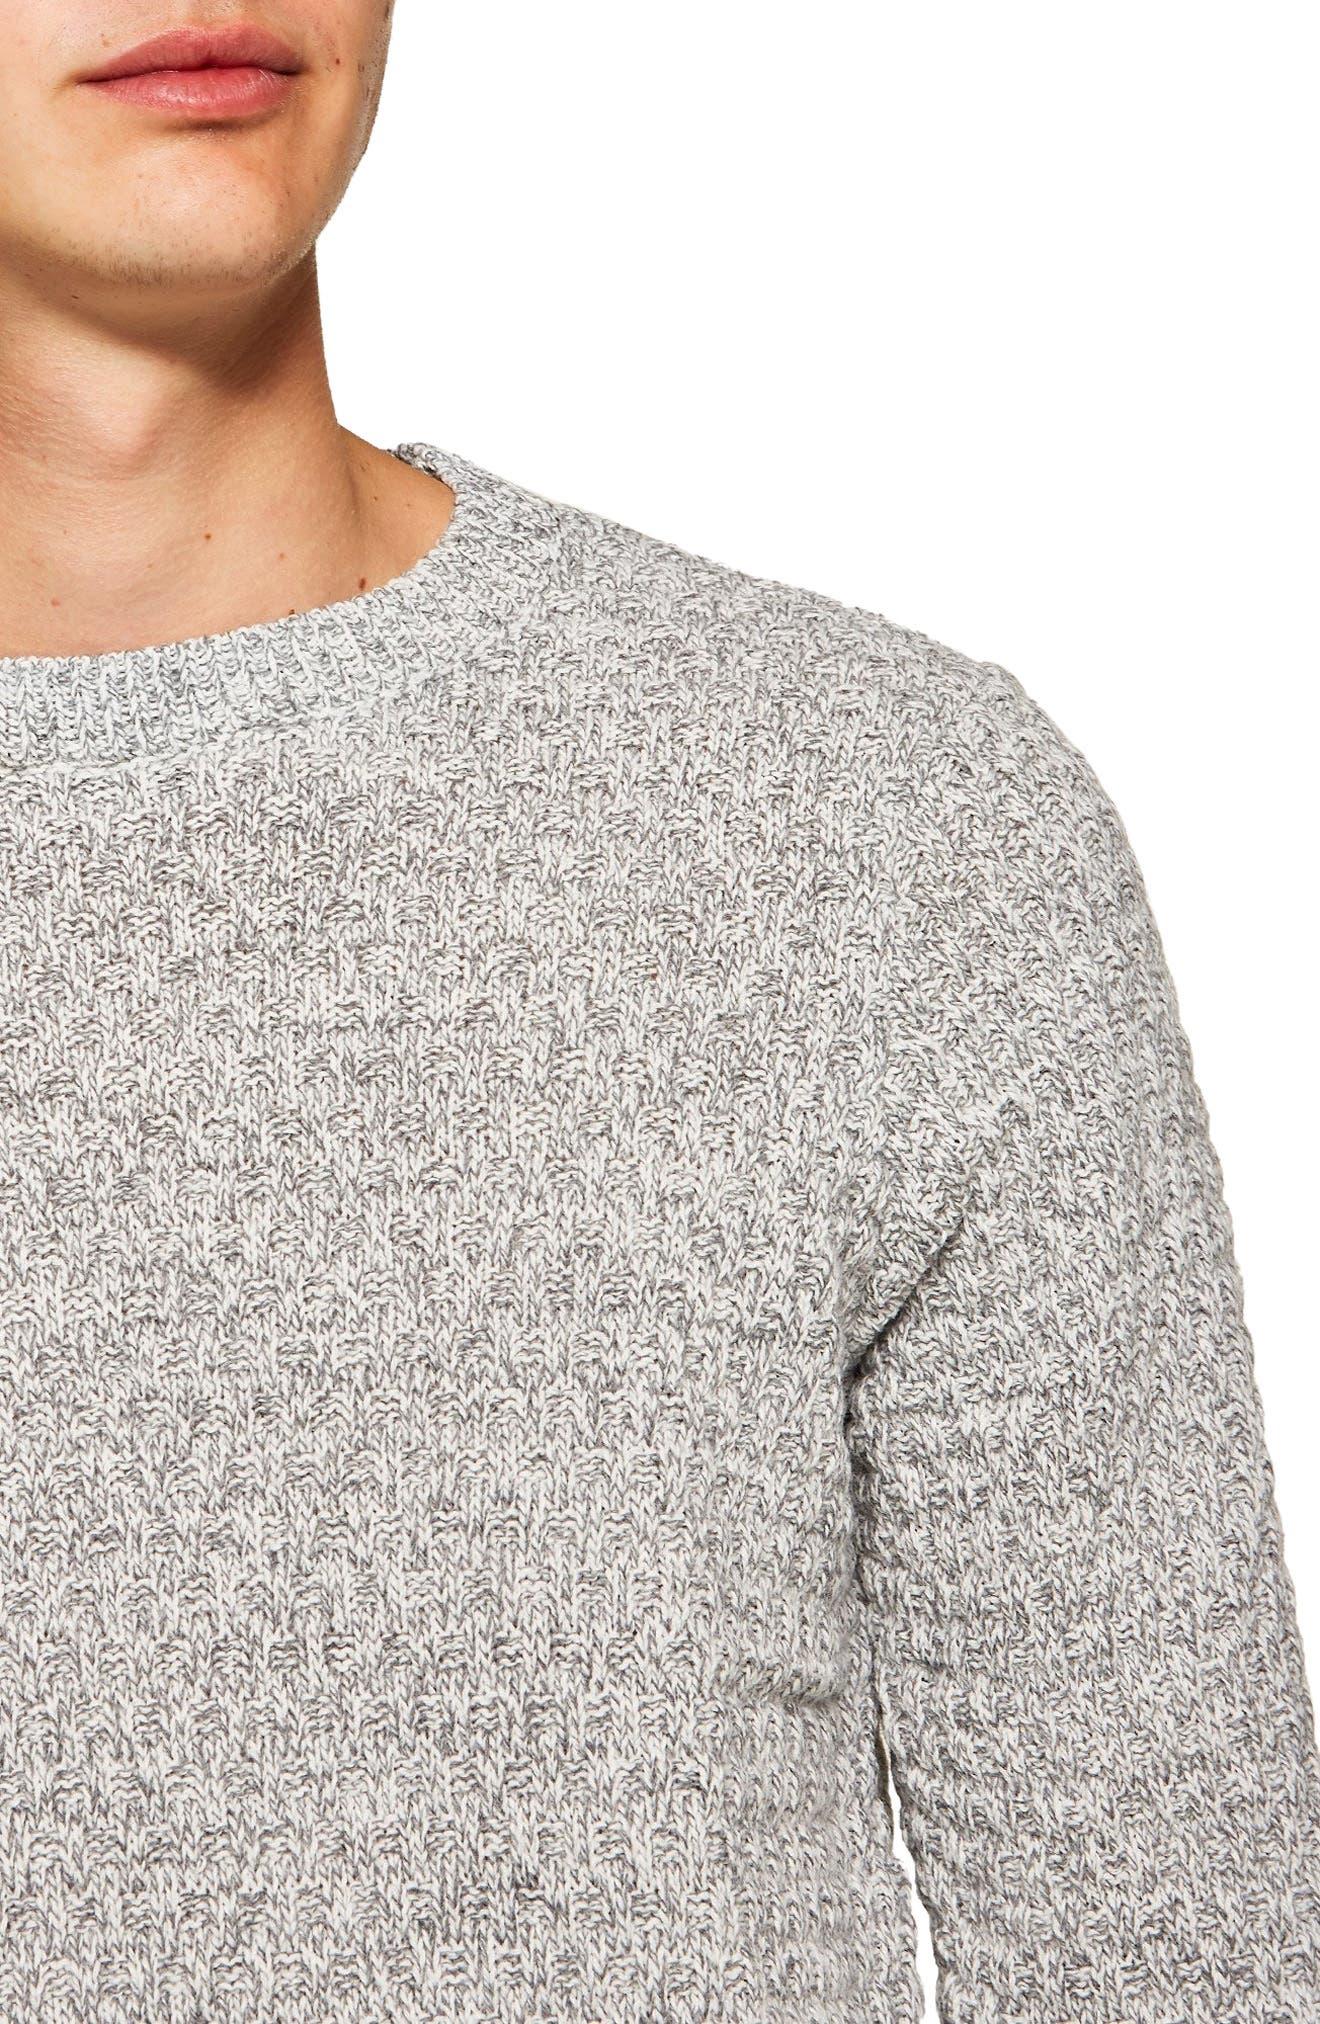 Textured Crewneck Sweater,                             Alternate thumbnail 3, color,                             020